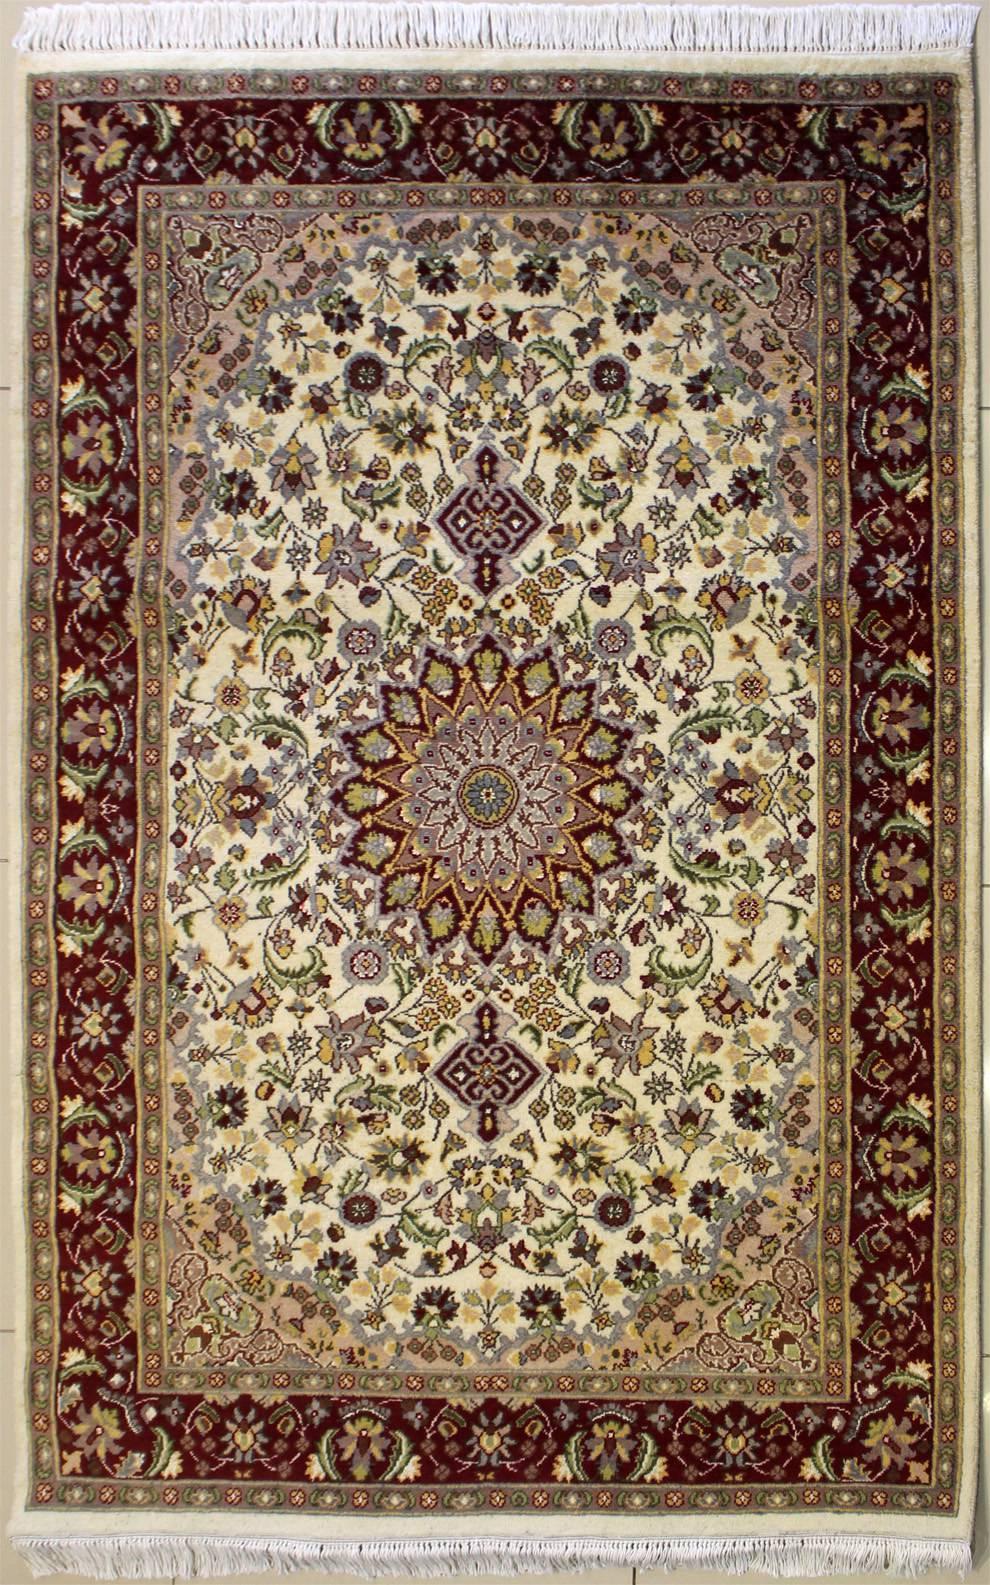 4'1x6'2 Rug - Floral - Handmade Pak Persian High Quality ...